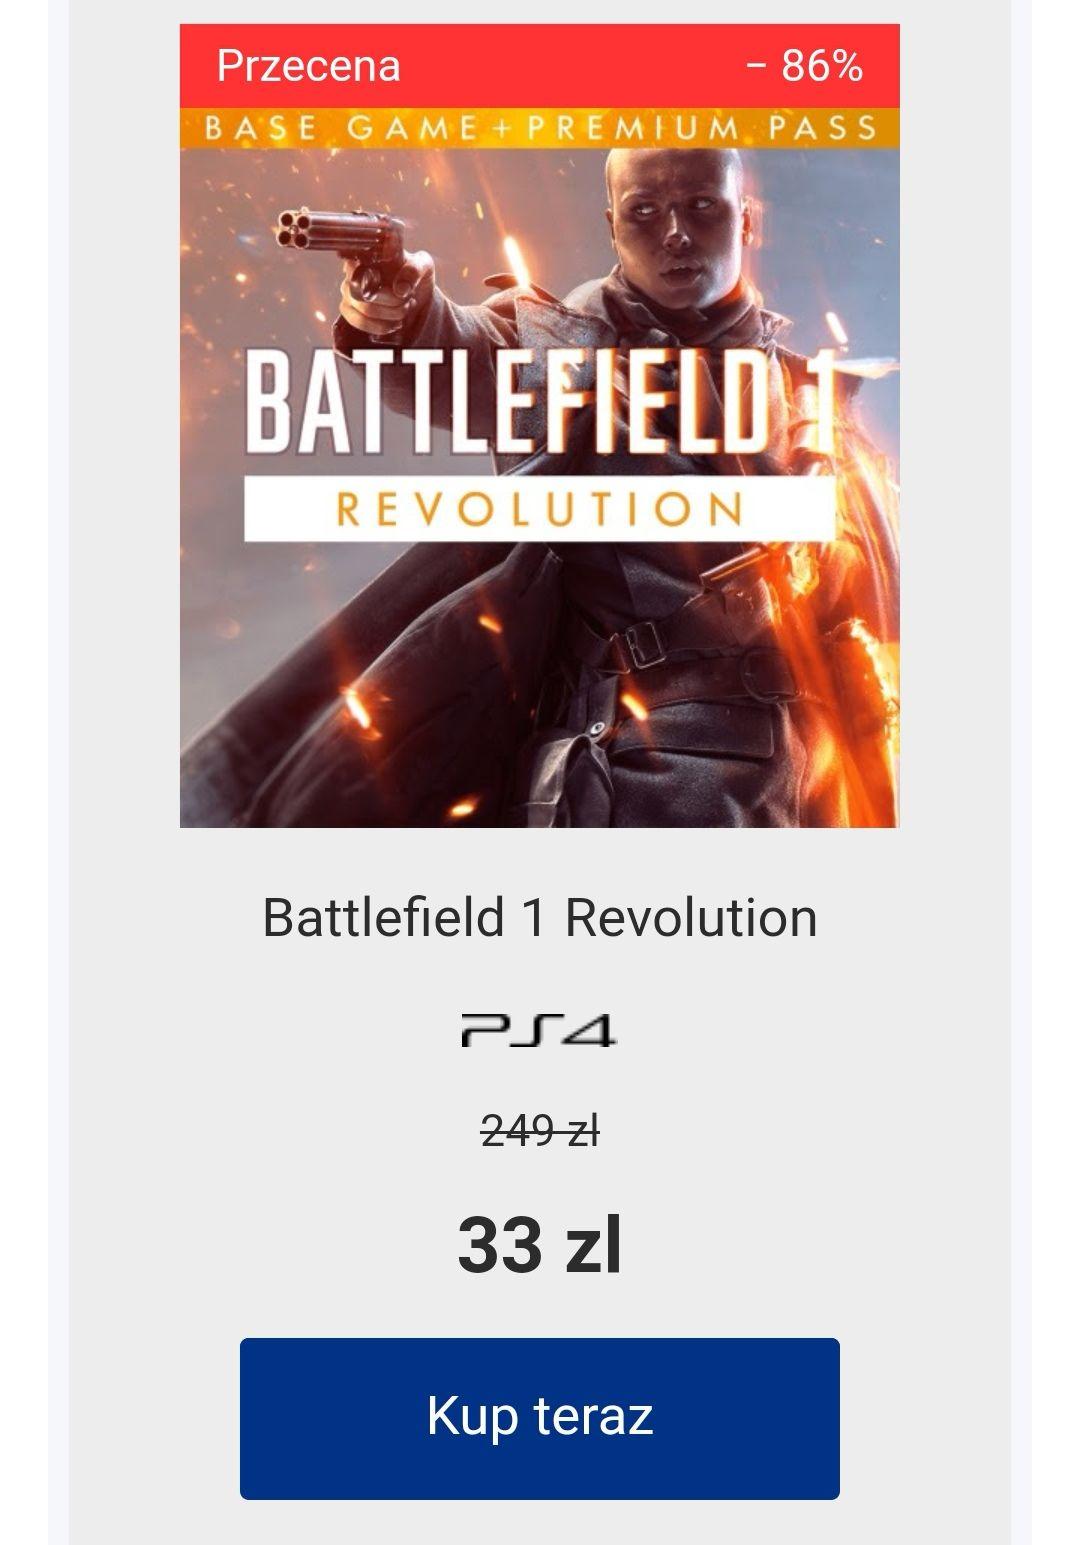 PS Store Battlefield 1 Revolution